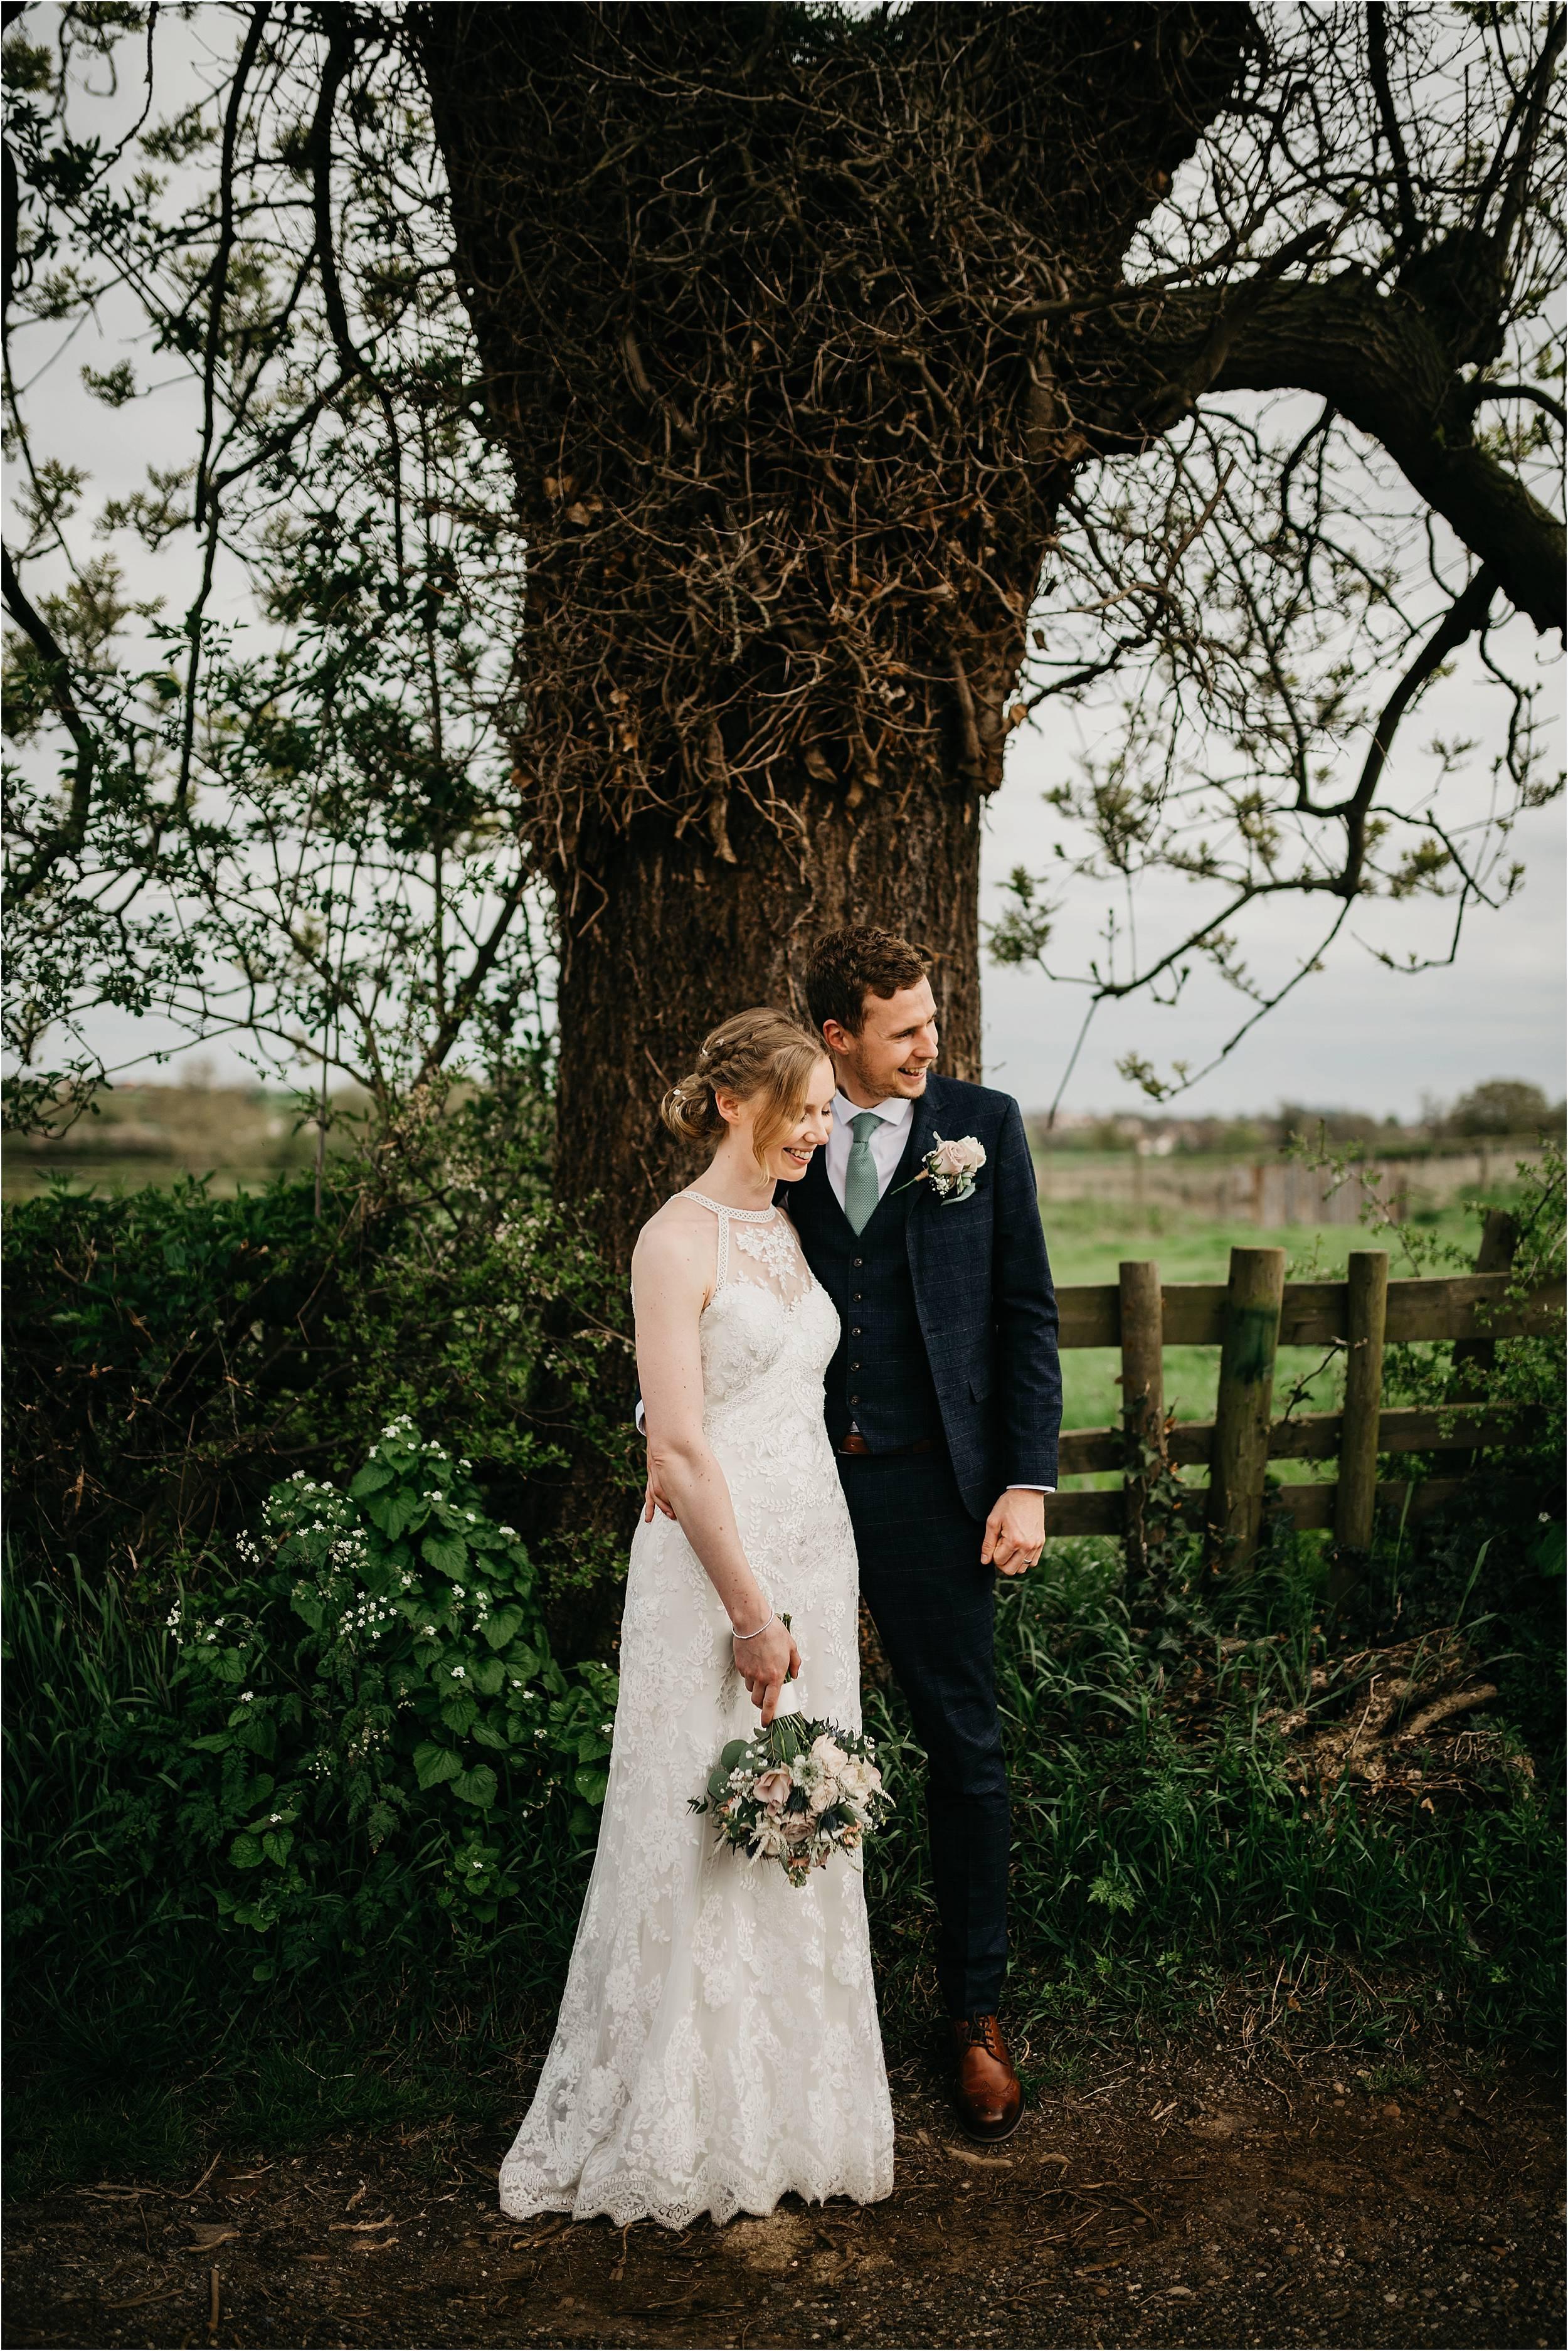 Kedleston Country House Wedding Photography_0072.jpg